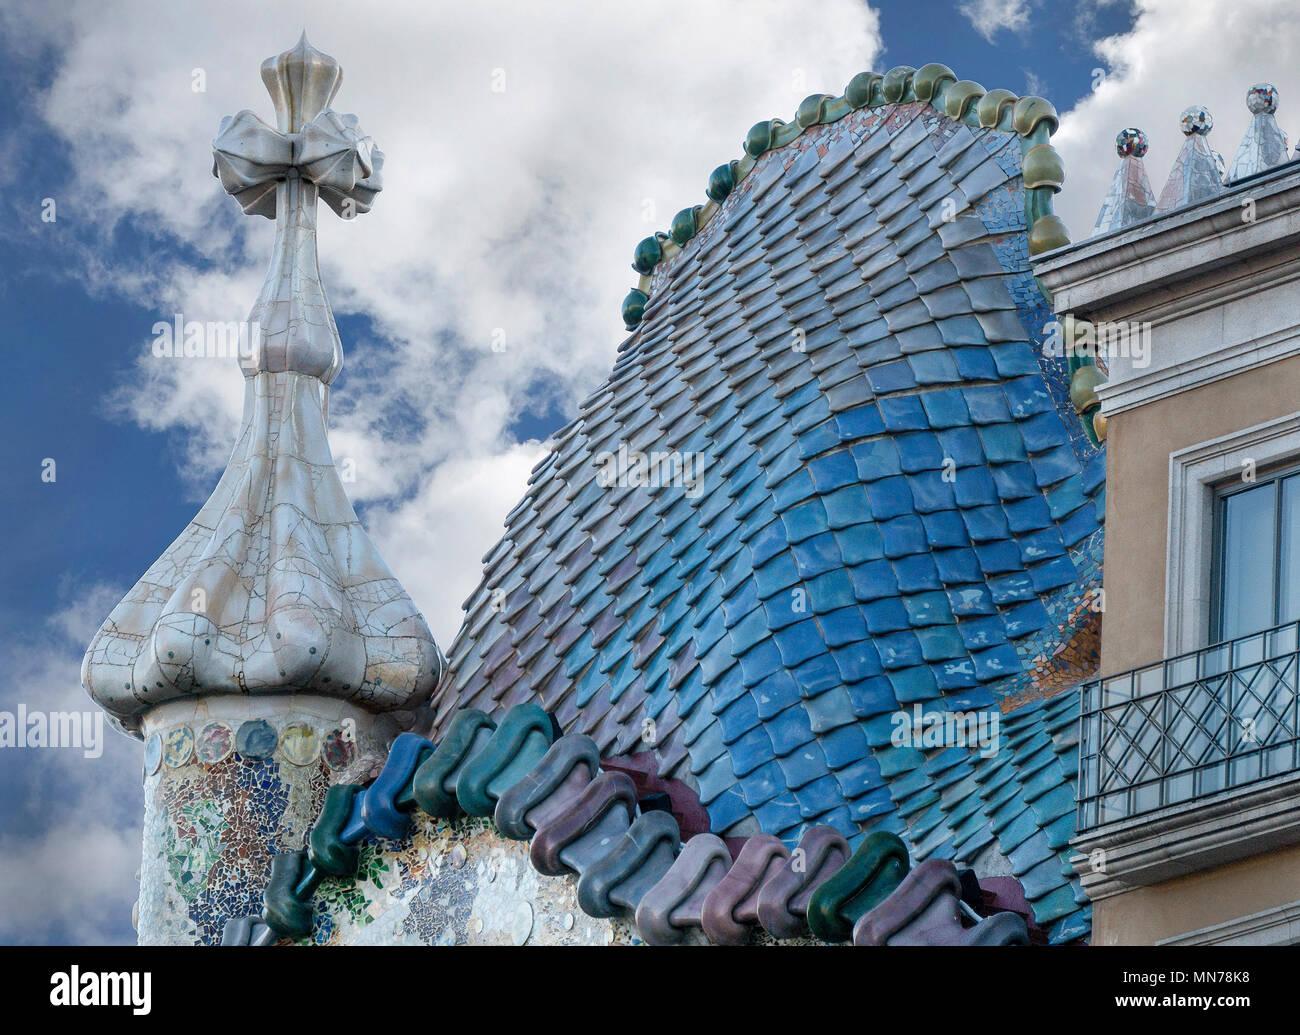 Dragon-Like Roof of Barcelona Casa Batlló by Architect Antoni Gaudí - Stock Image